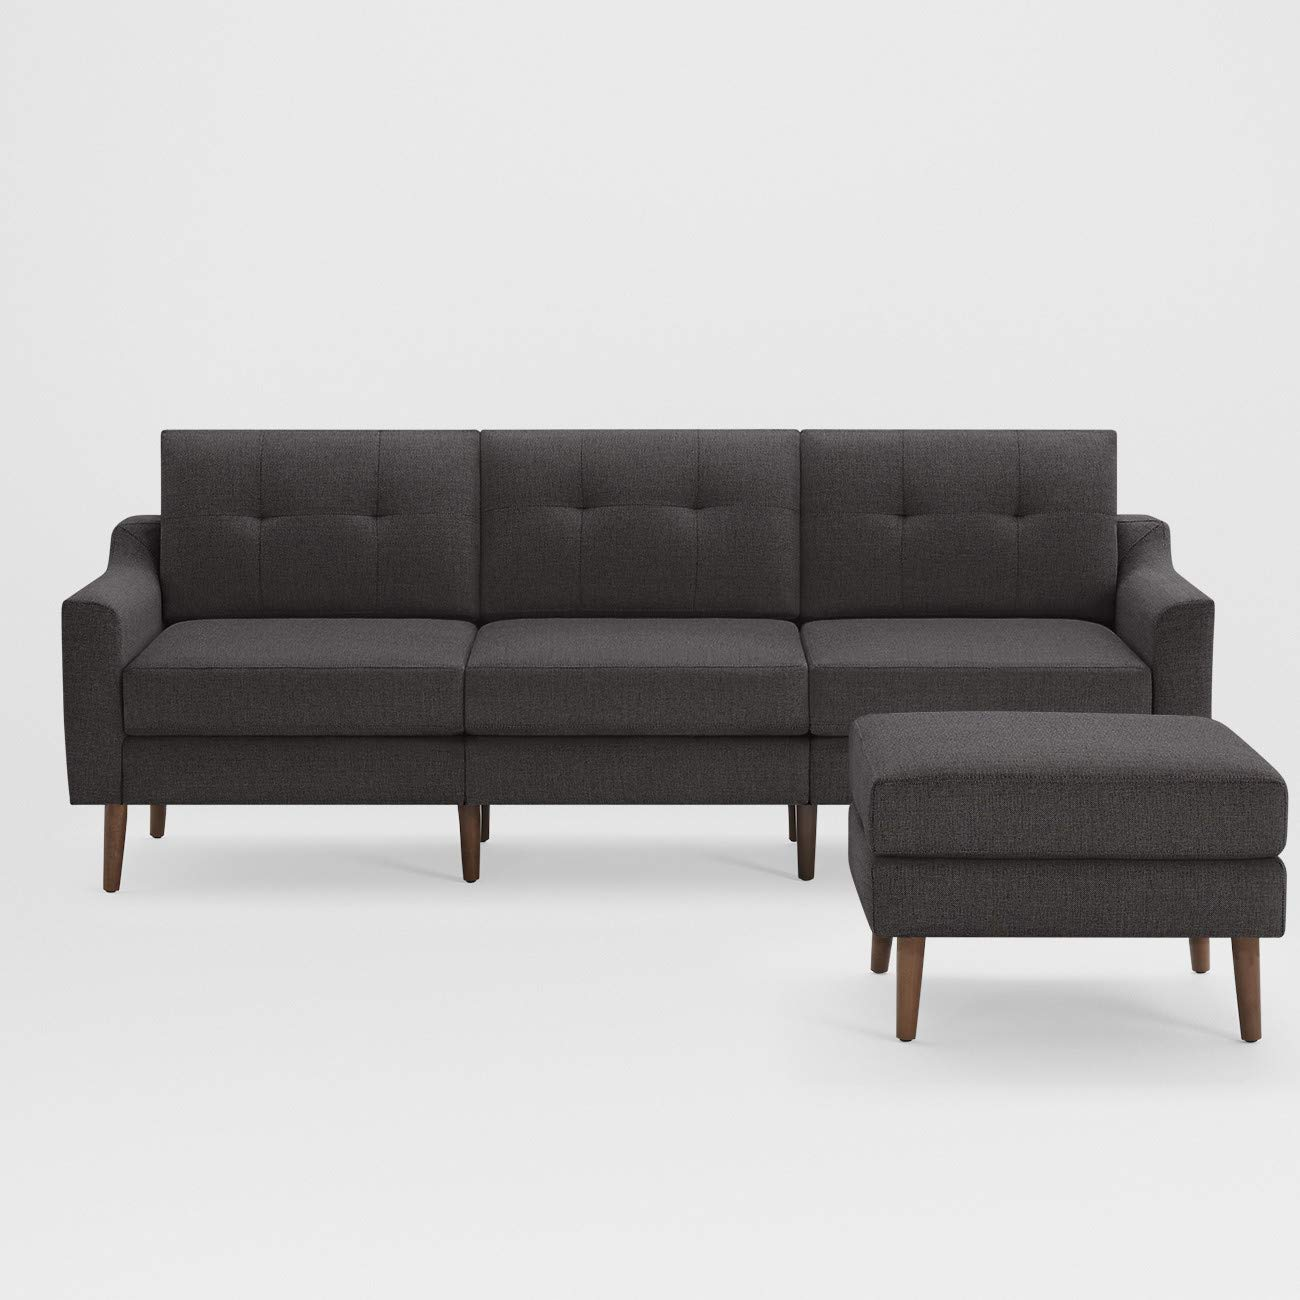 Brilliant Amazon Com Burrow Nomad Mid Century Modern Fabric King Sofa Machost Co Dining Chair Design Ideas Machostcouk